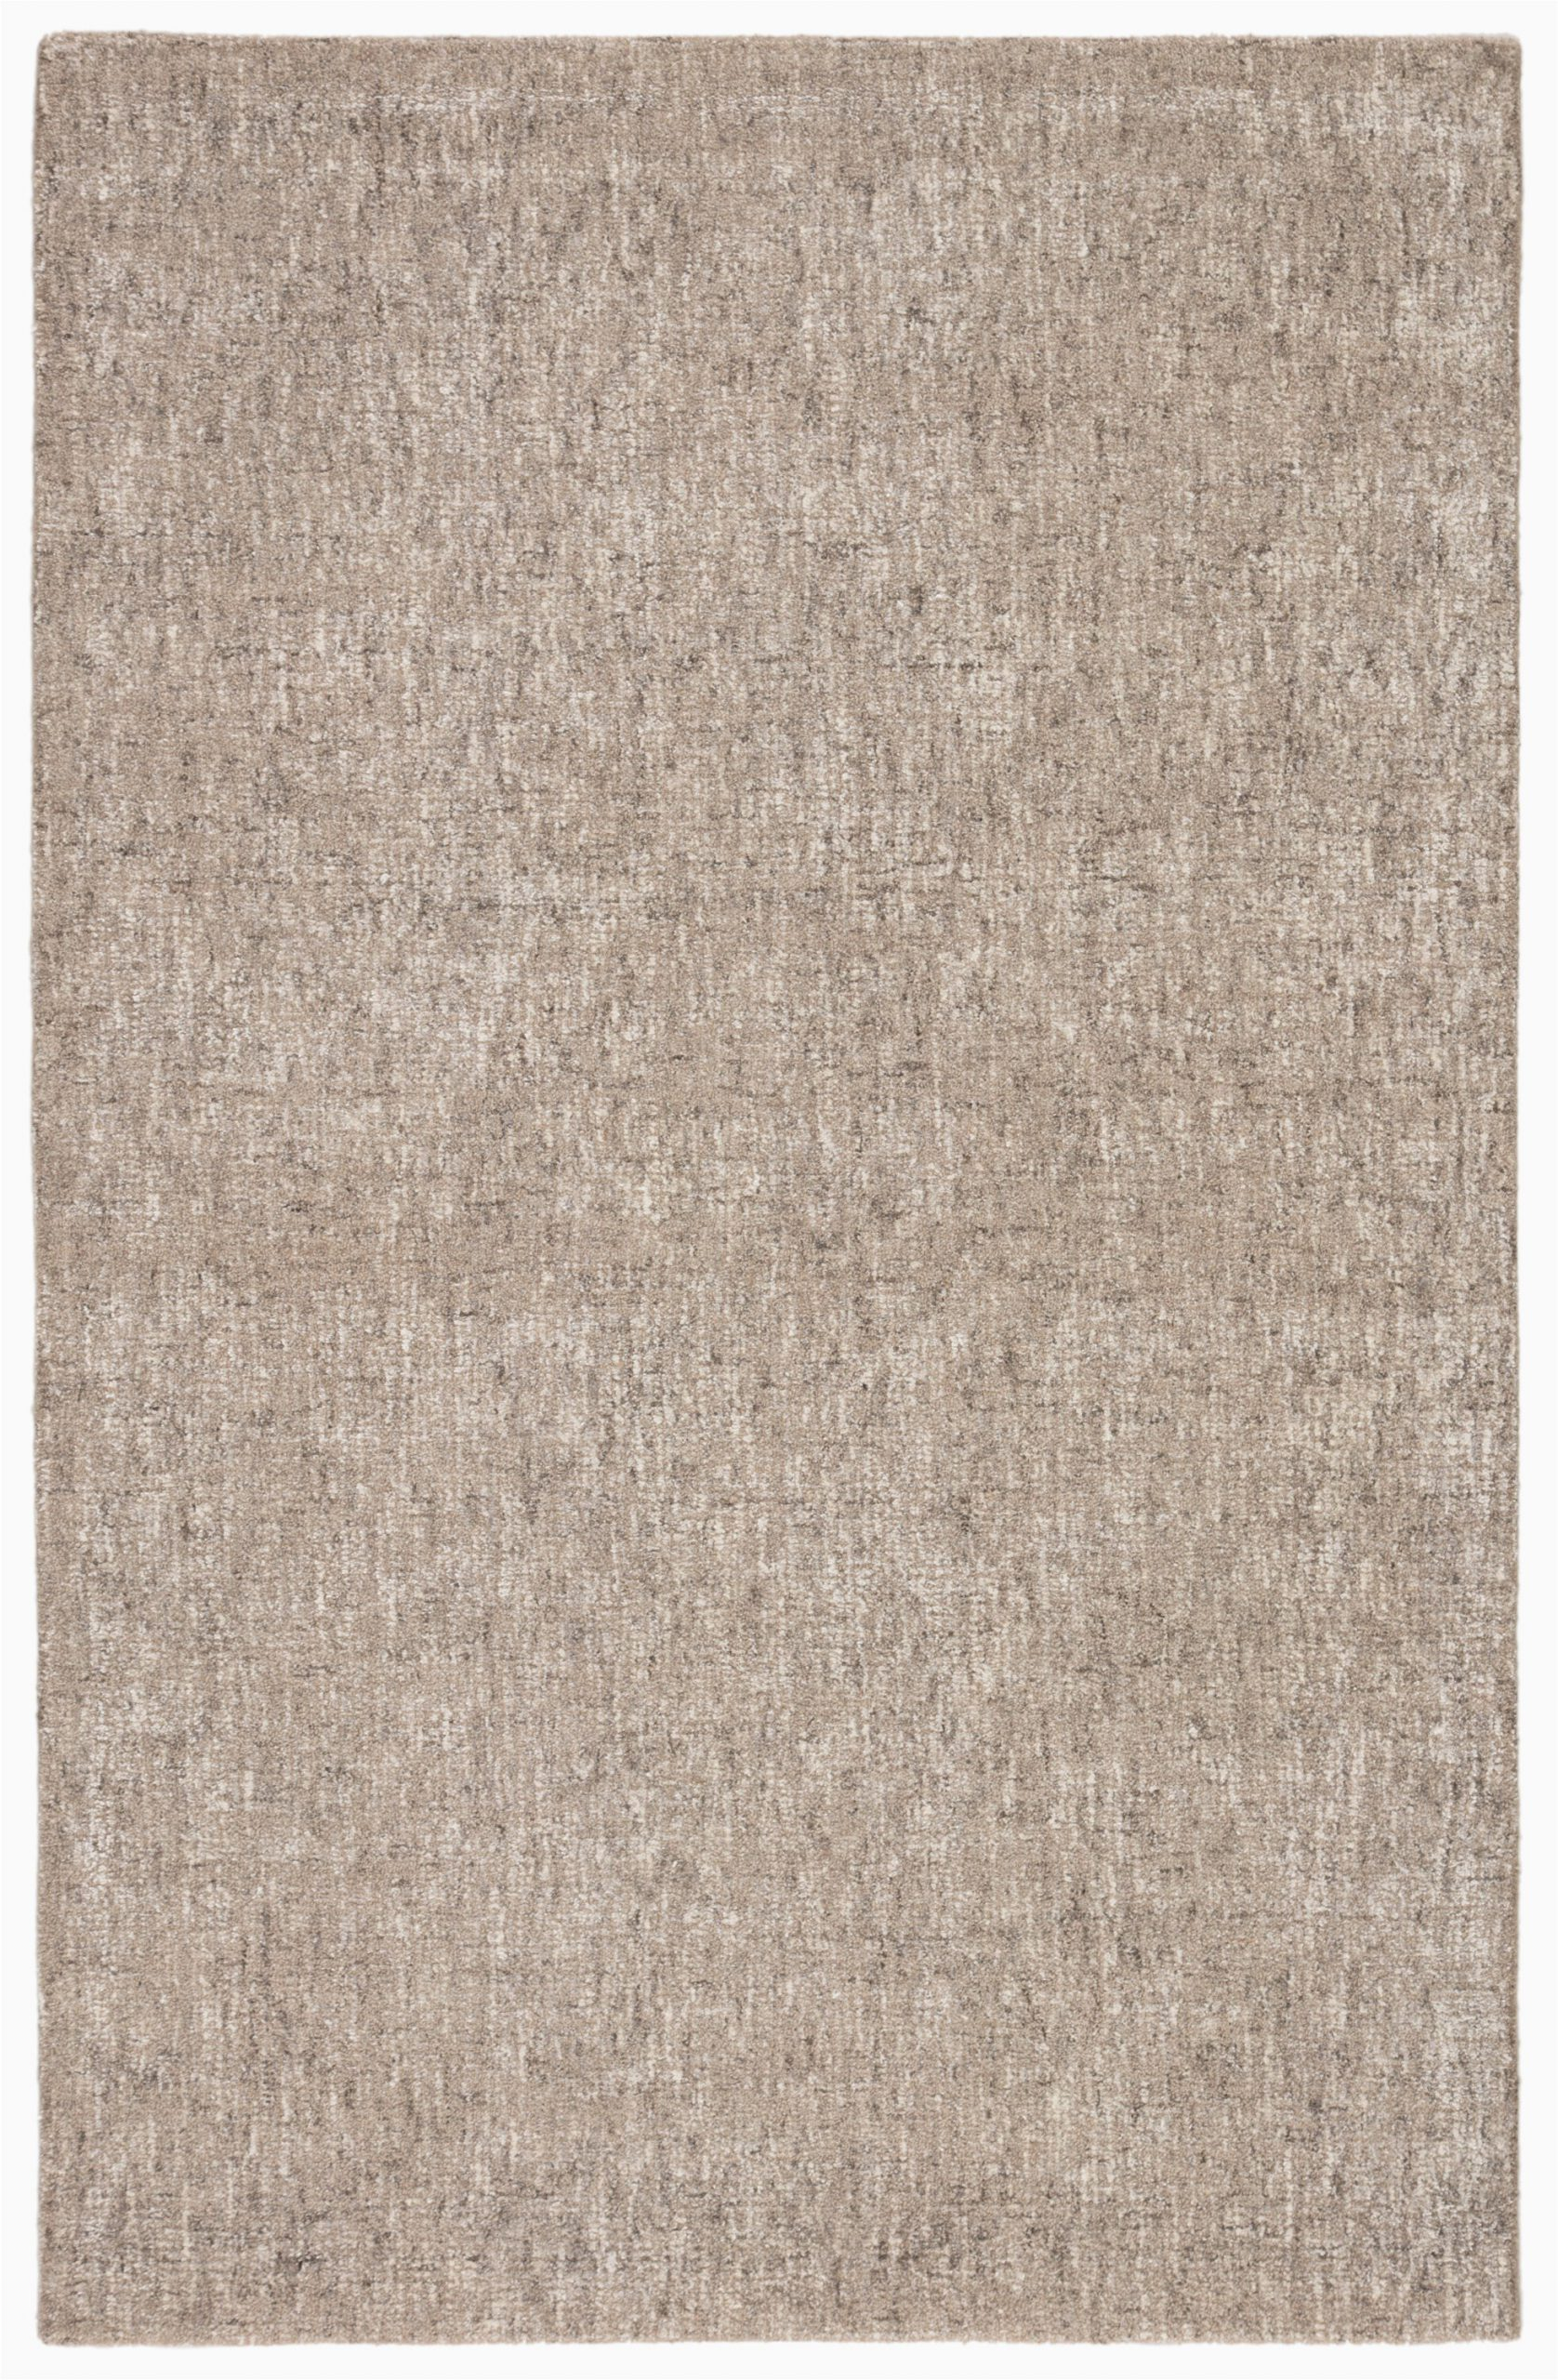 bernards hand tufted taupe area rug